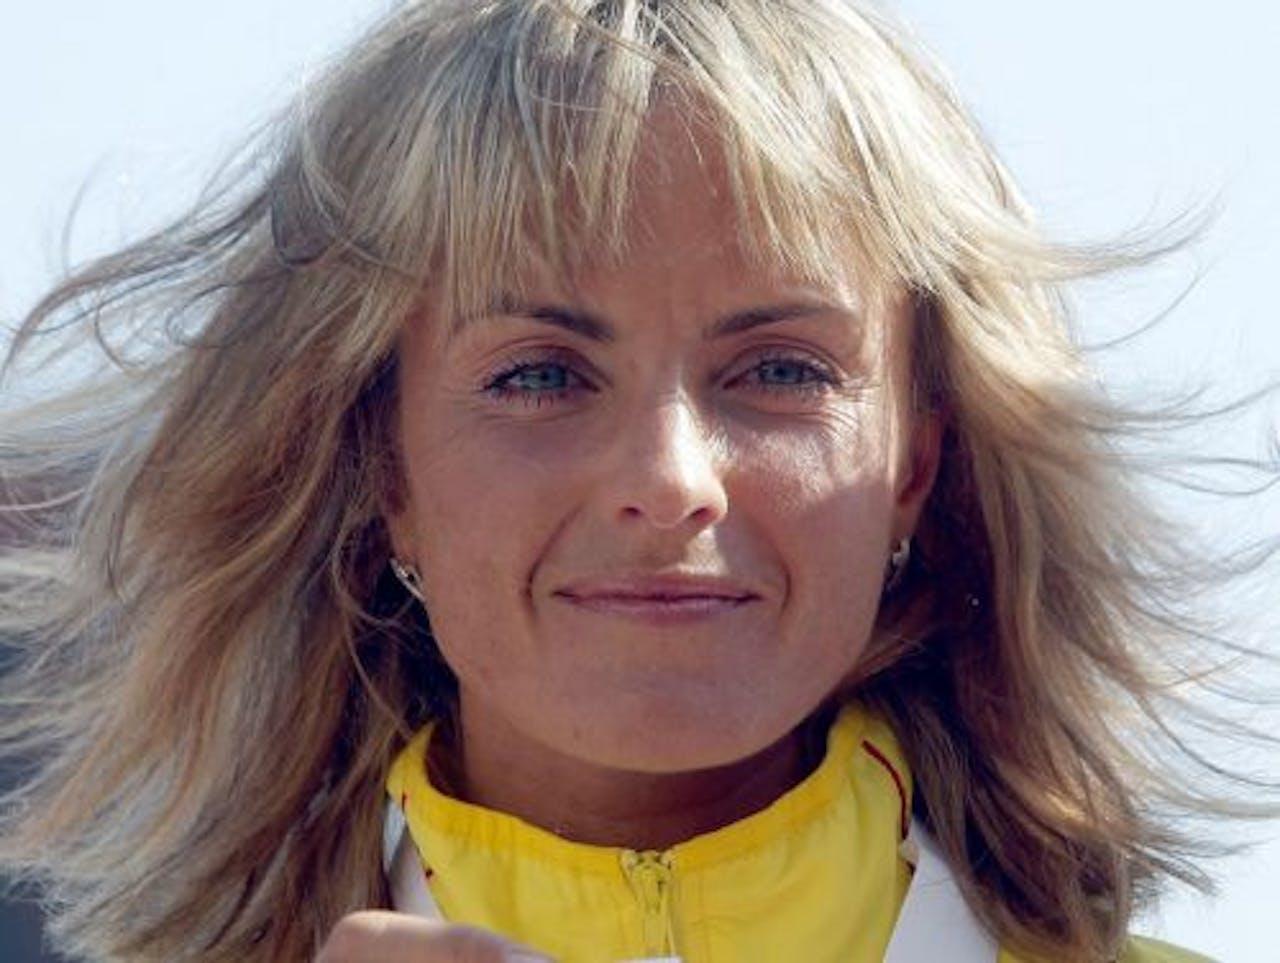 De Litouwse atlete Zivile Balciunaite. EPA